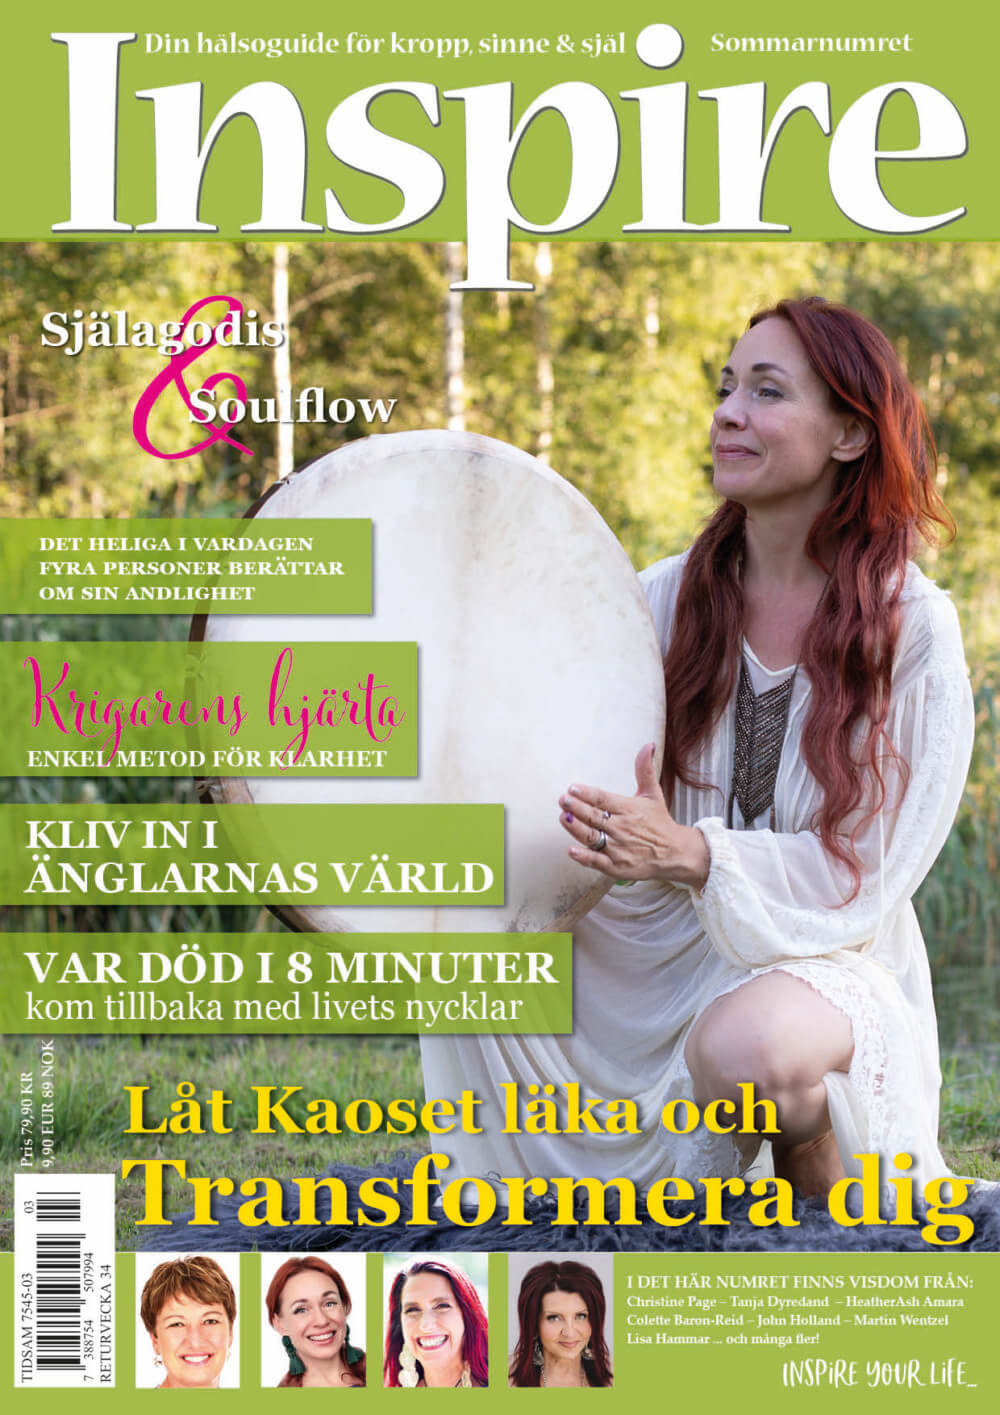 Zoës krönika, Inspire tidningen, juli 2020